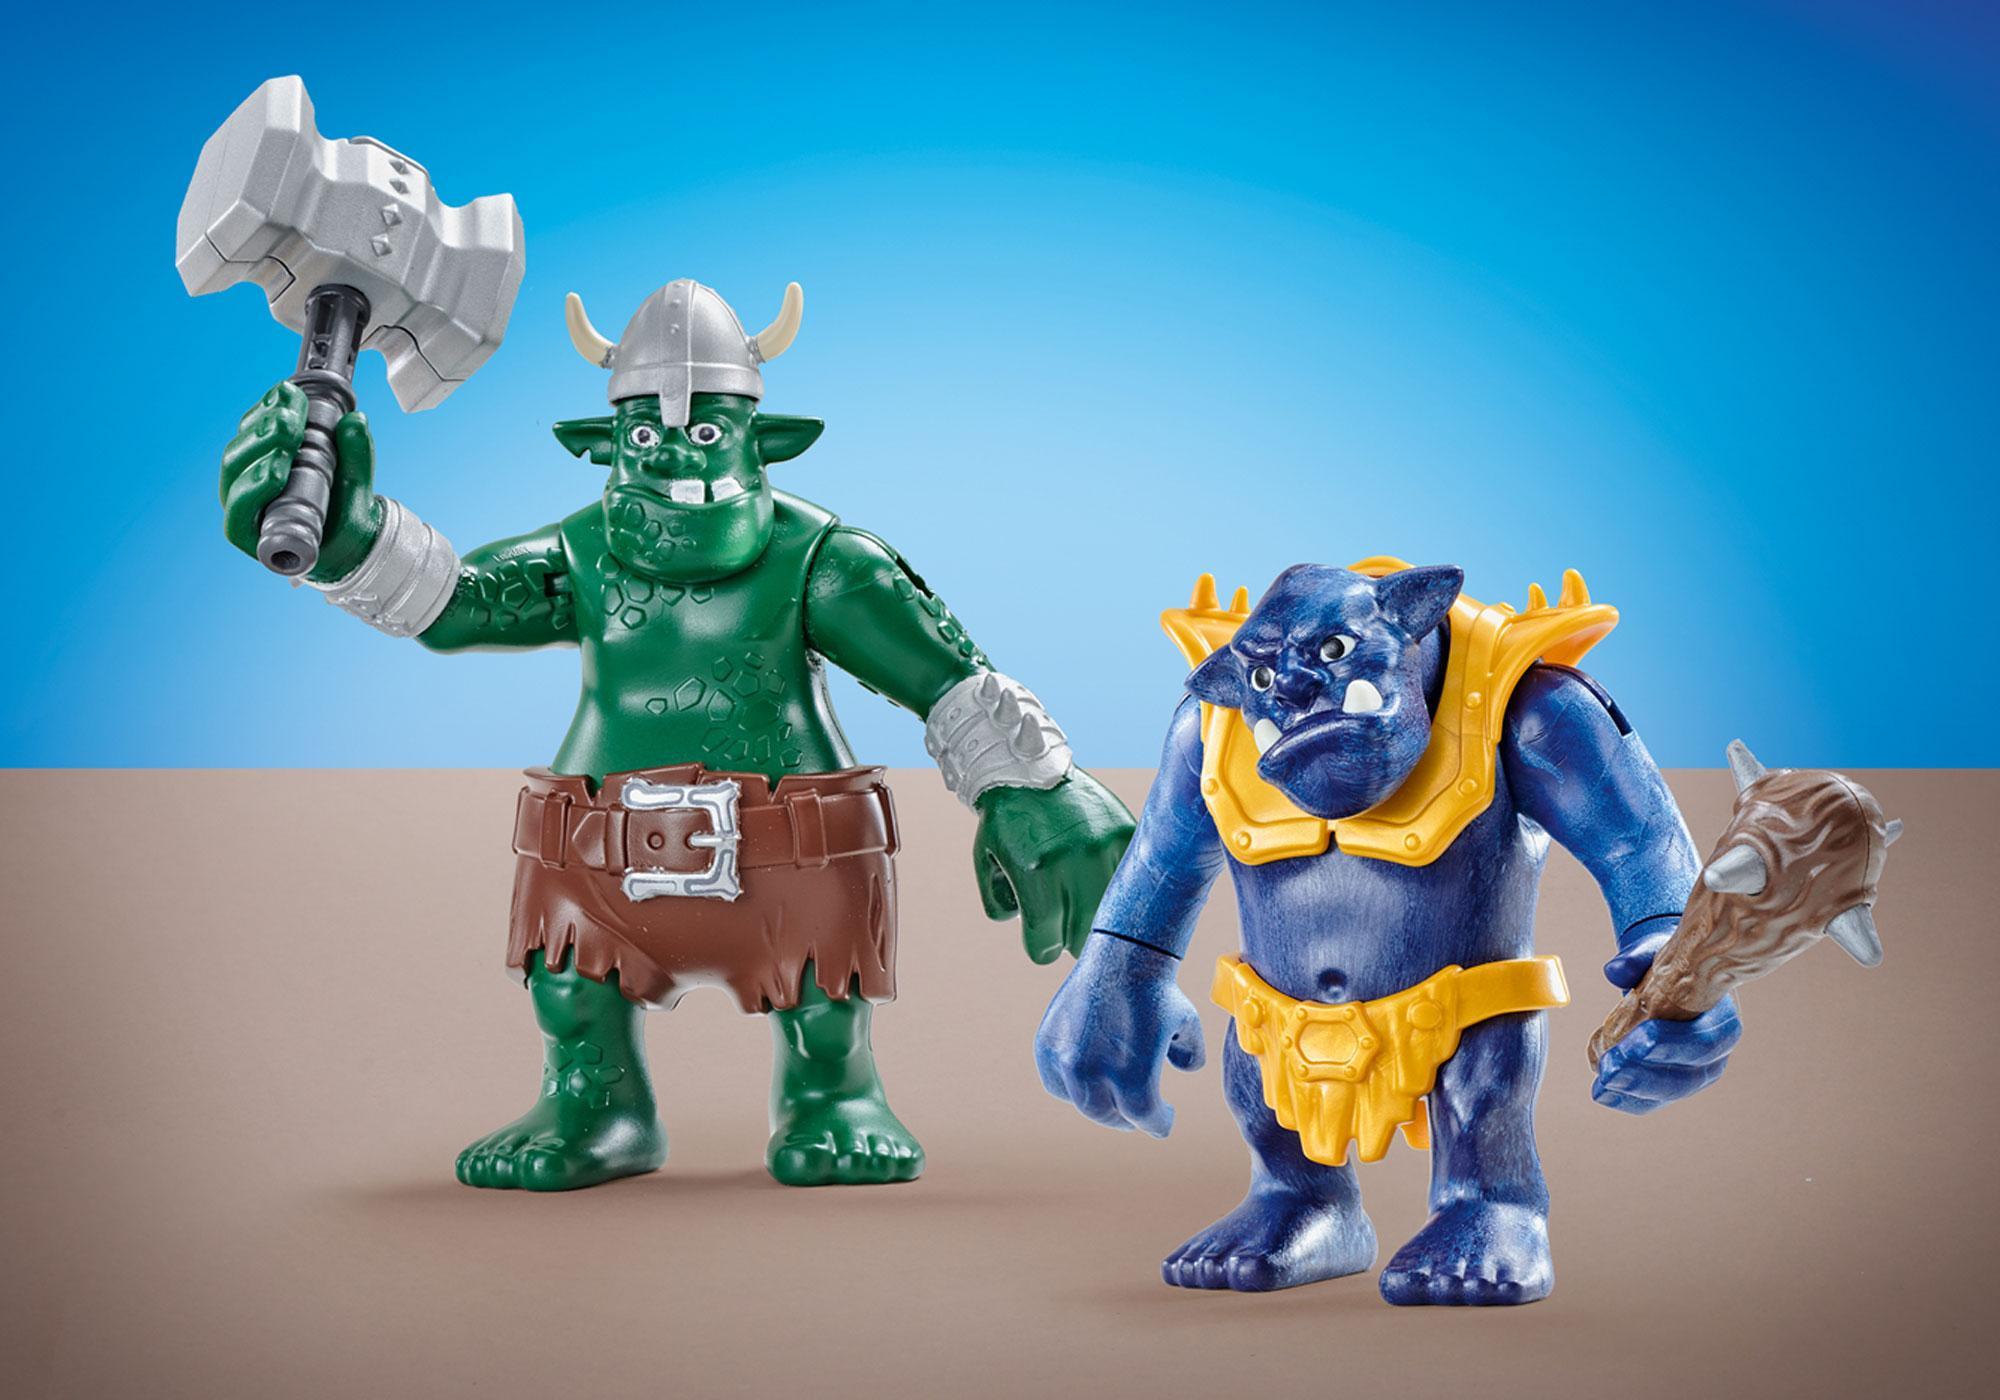 http://media.playmobil.com/i/playmobil/6593_product_detail/Two Giant Trolls